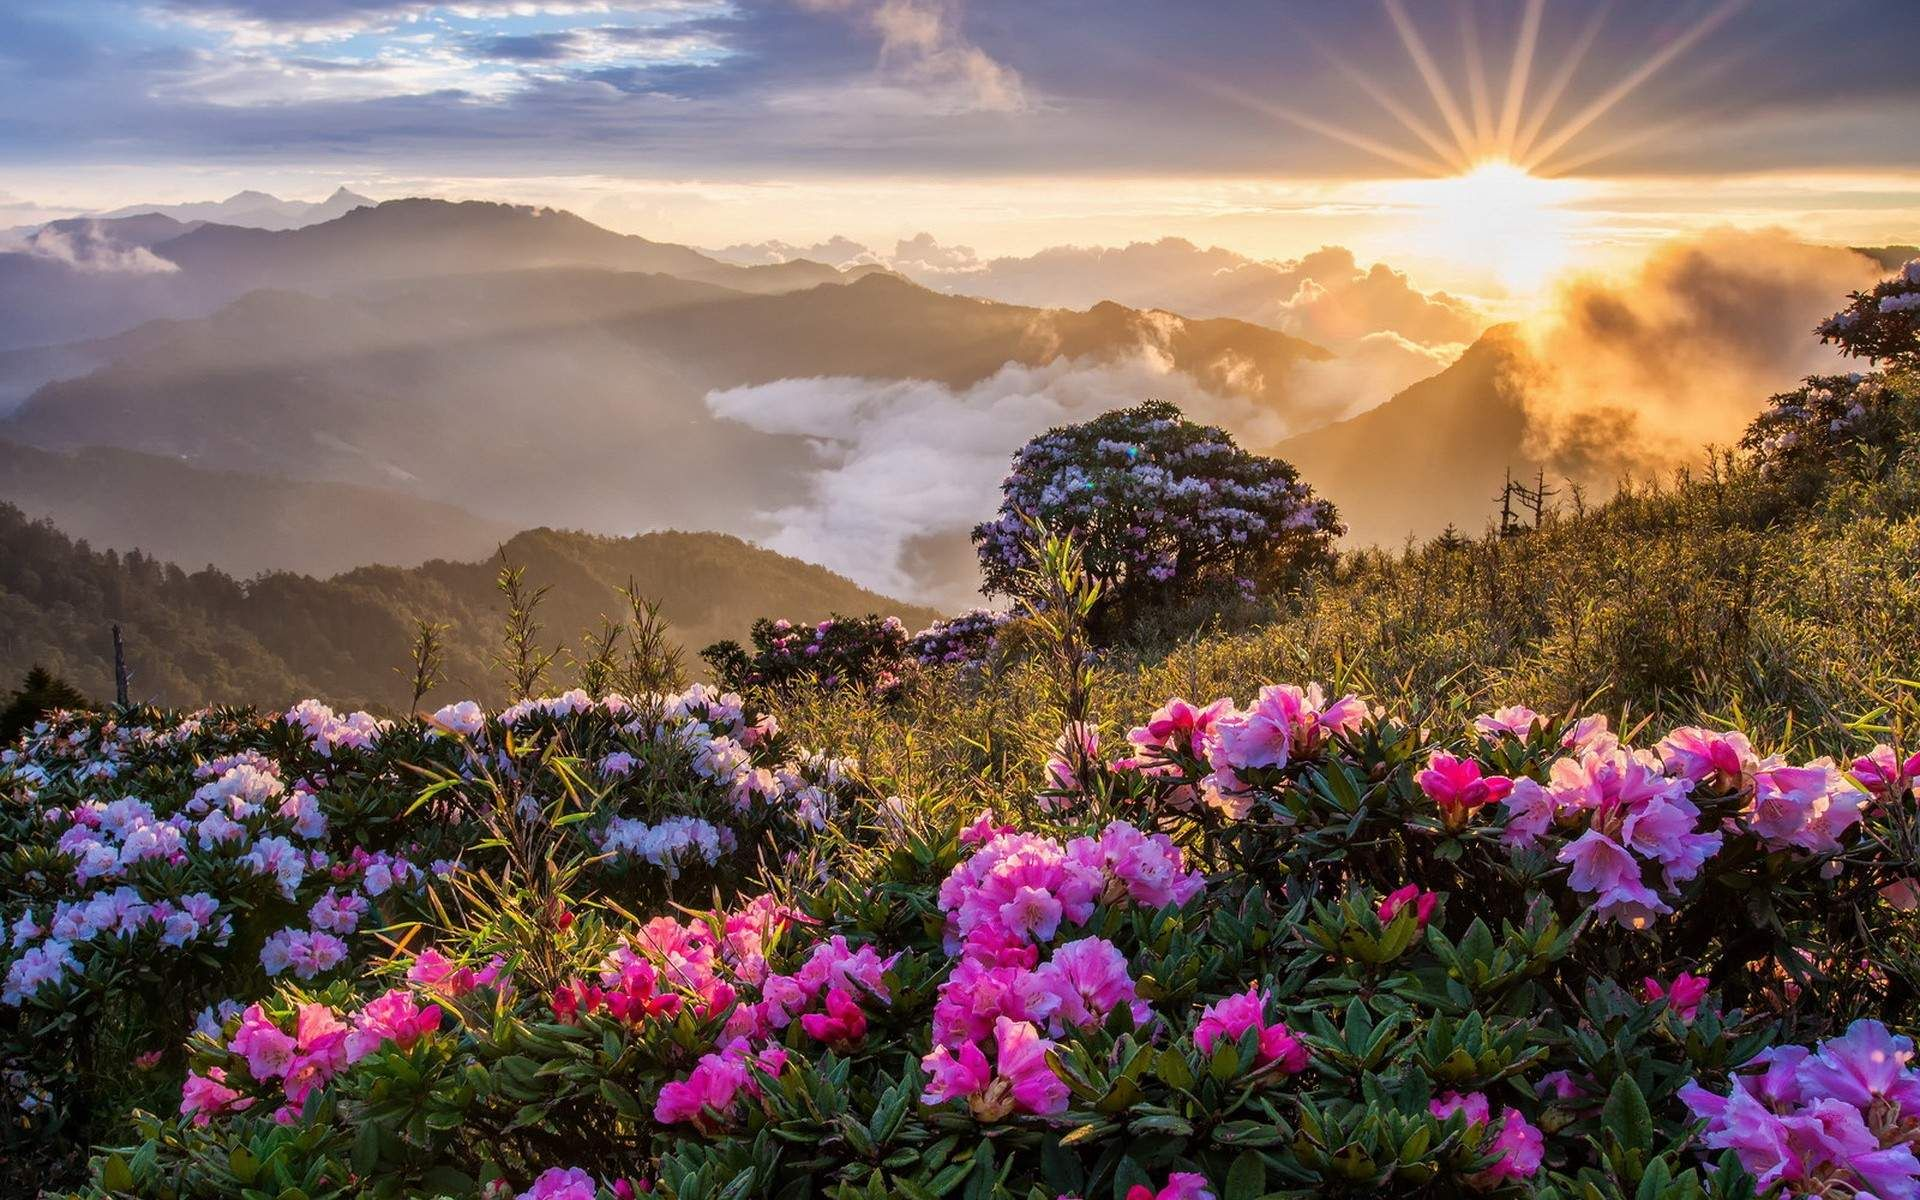 Mountain Sunrise Beautiful Landscape Wallpaper For Desktop In High Resolution Free Download Beautiful Landscape Wallpaper Beautiful Landscapes Beautiful Nature